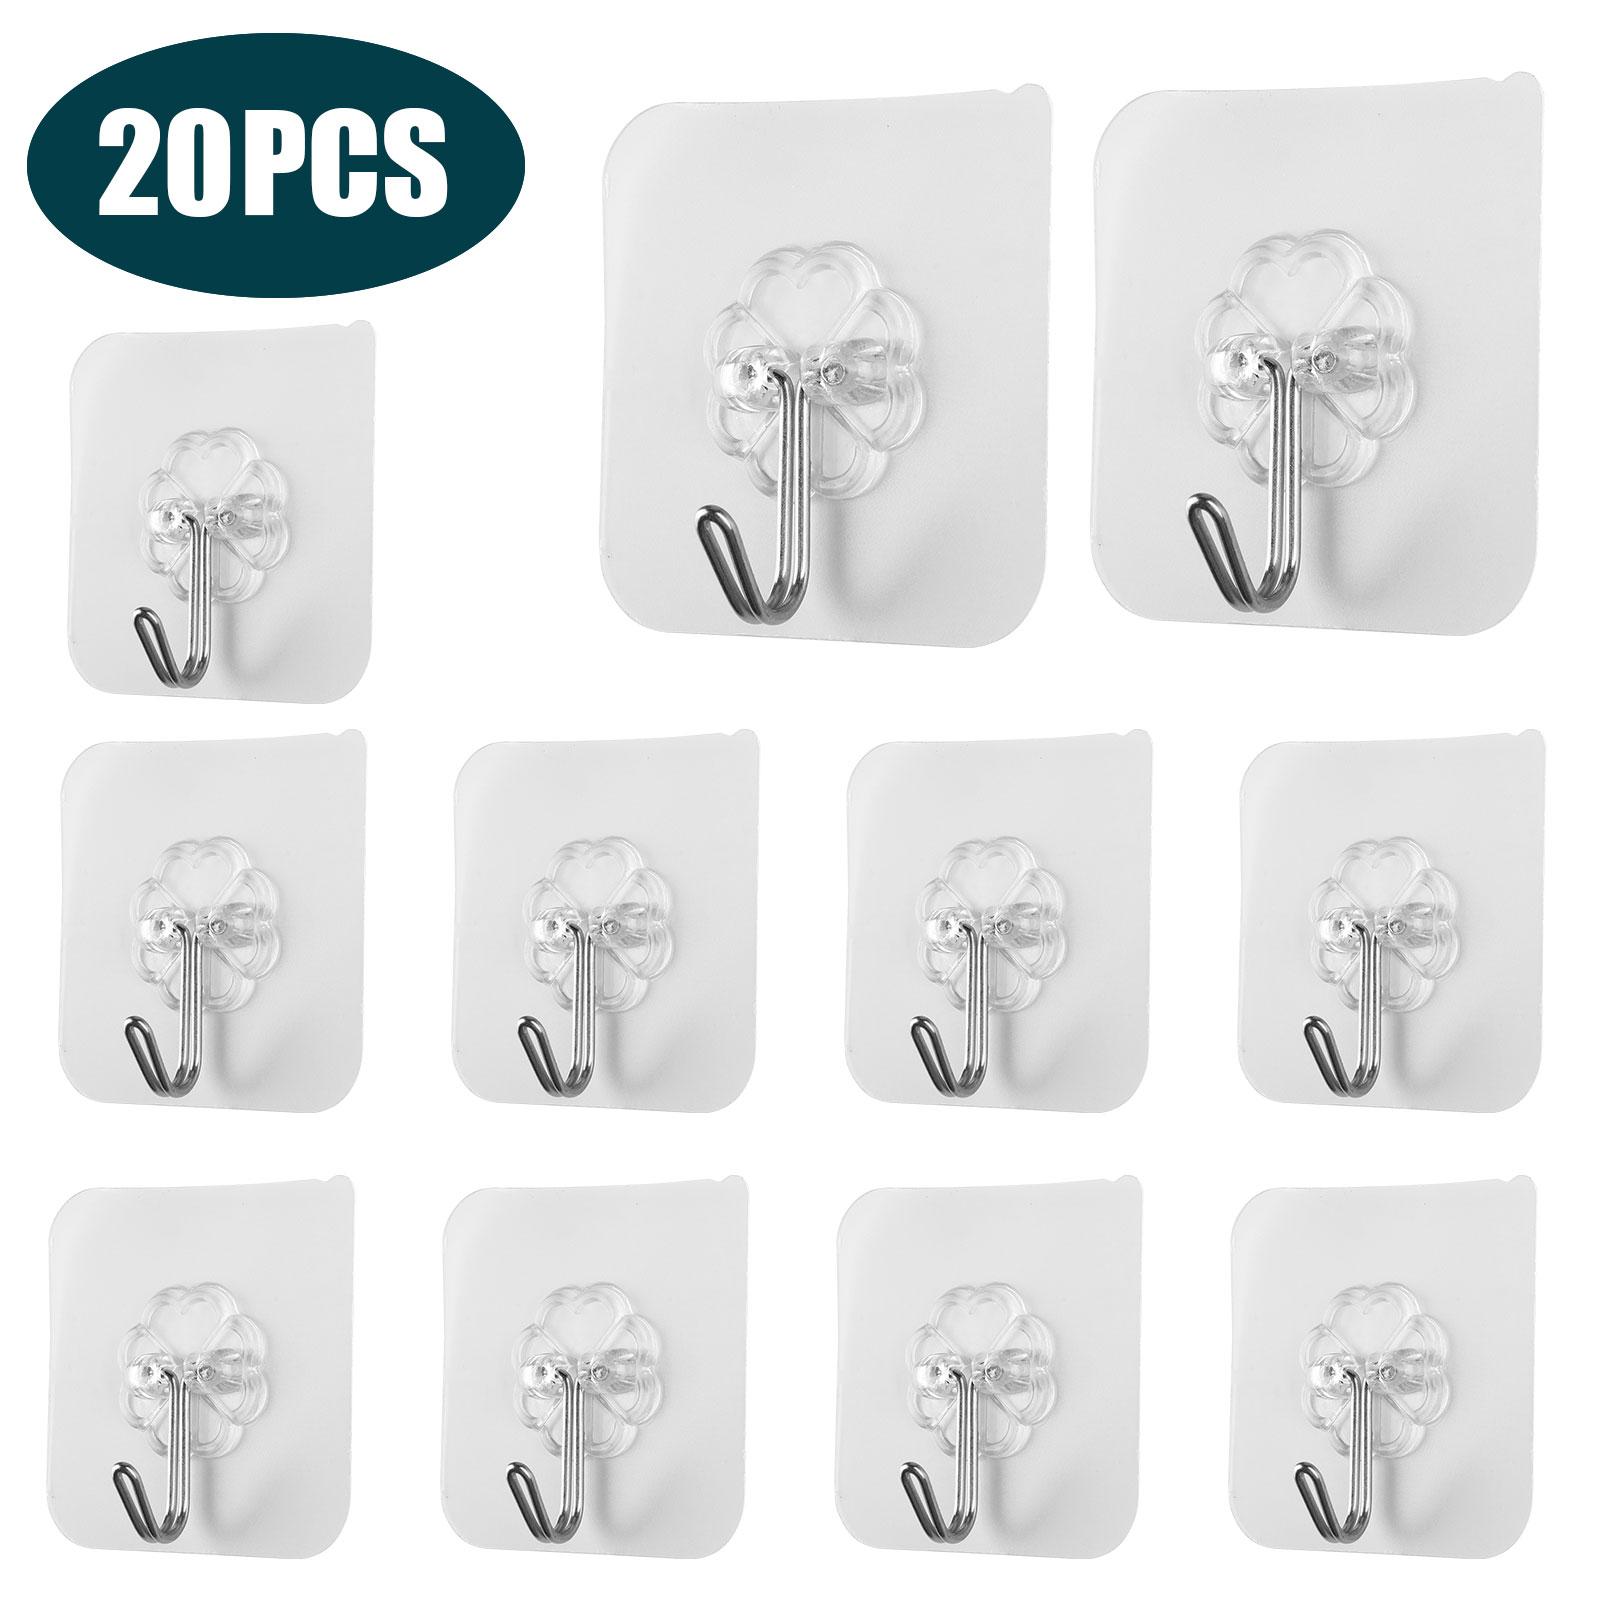 20-40x-Adhesive-Sticky-Hooks-Heavy-Duty-Wall-Seamless-Hooks-Hangers-Transparent thumbnail 10